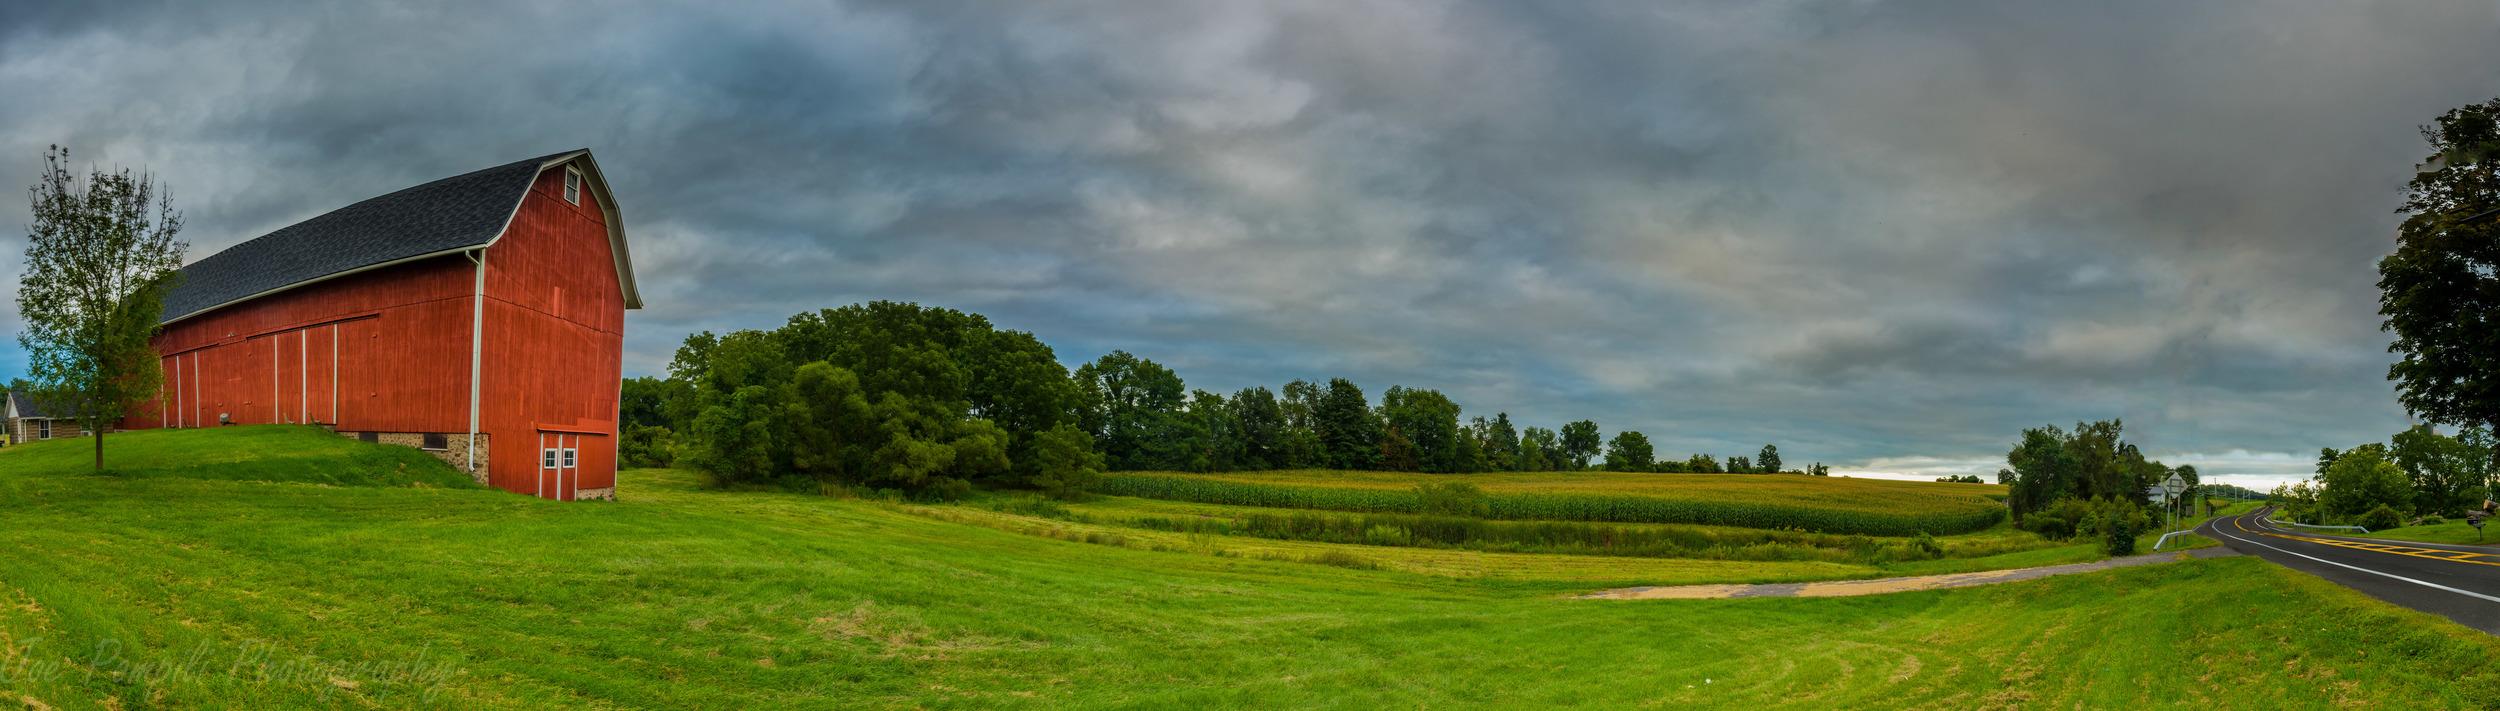 Pittsford Farm (Panoramic) #1P